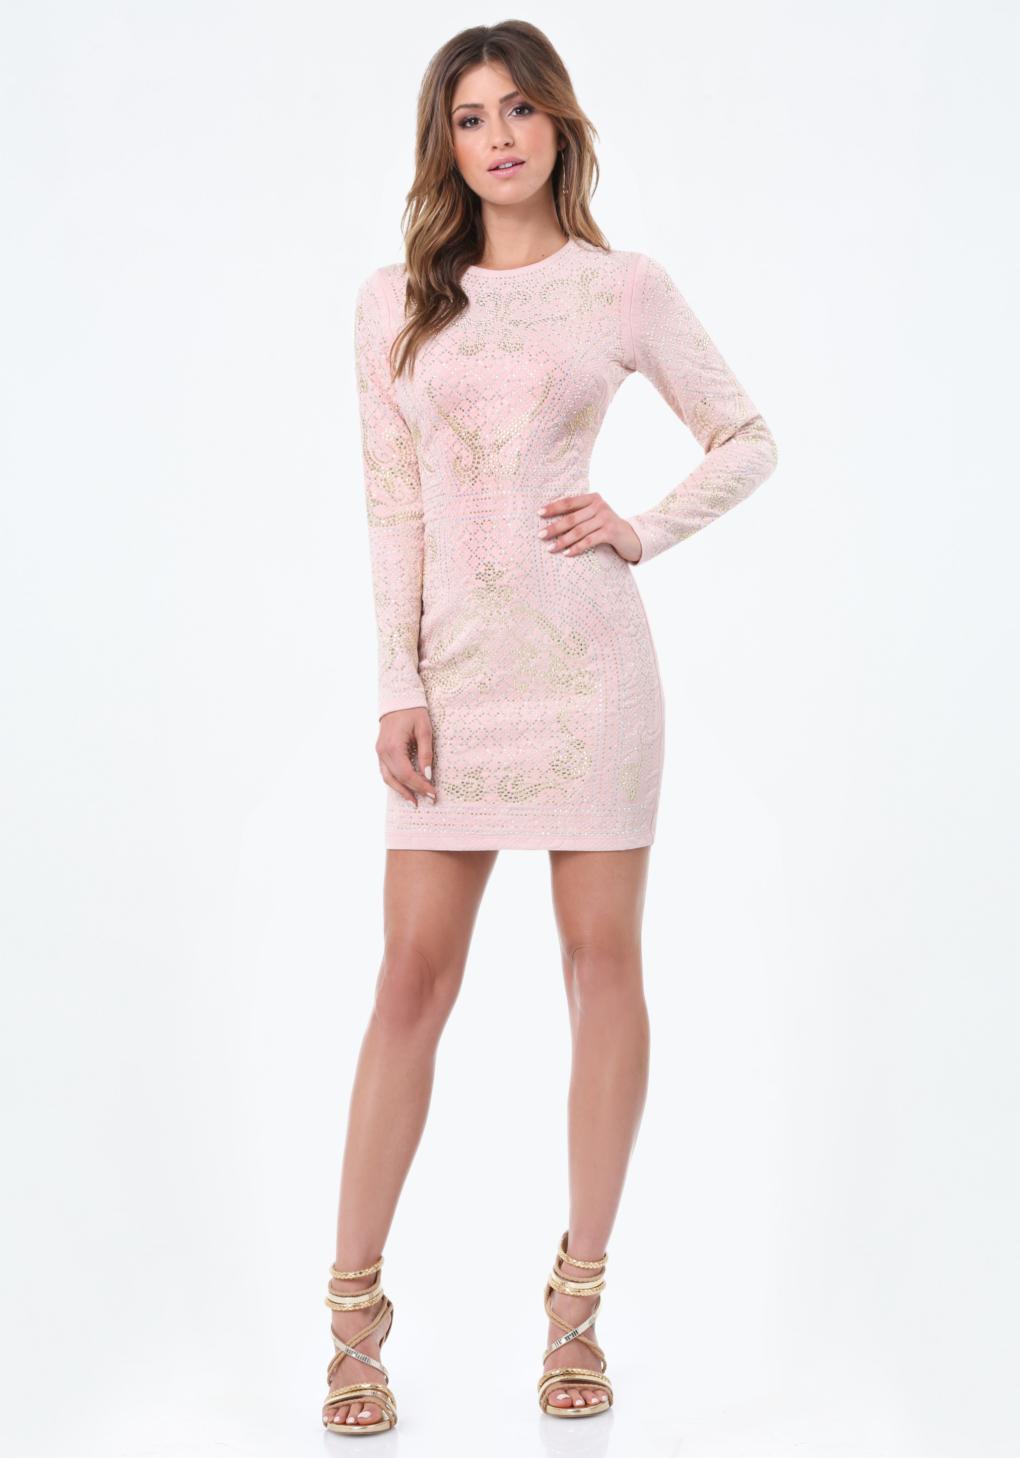 Bebe studded jacquard dress in pink lyst for Bebe dresses wedding guest